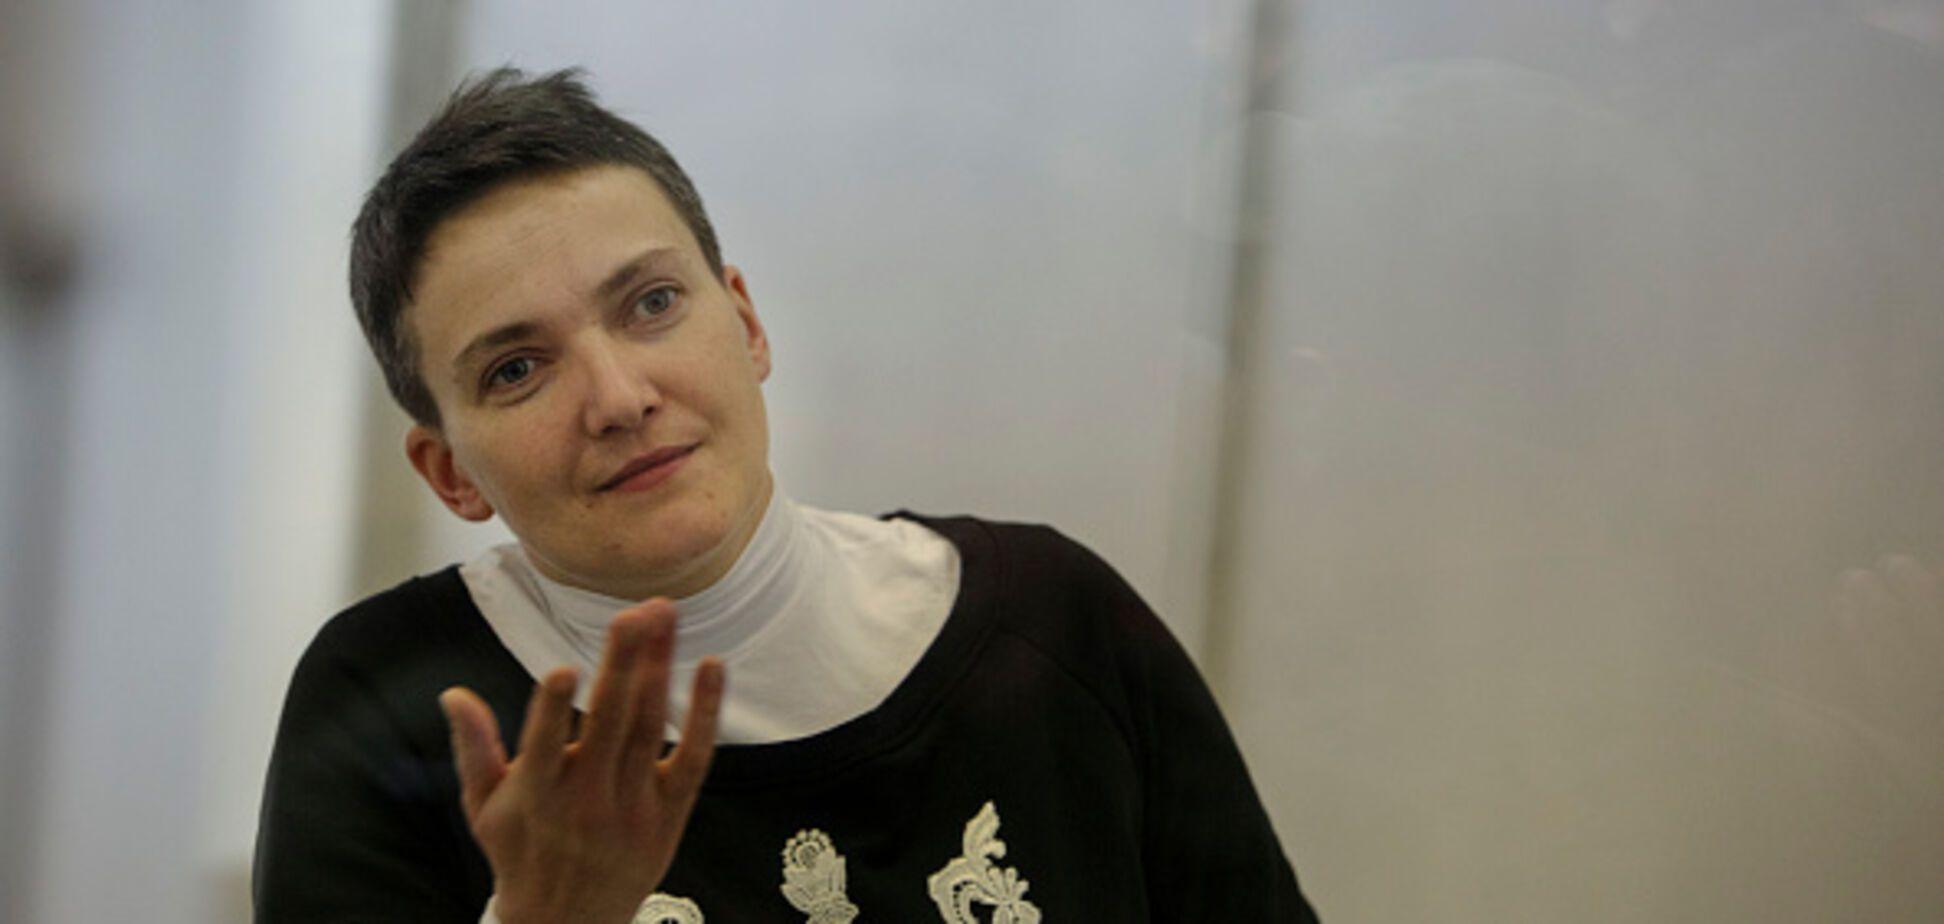 Справа Савченко: ГПУ хоче заарештувати майно нардепа